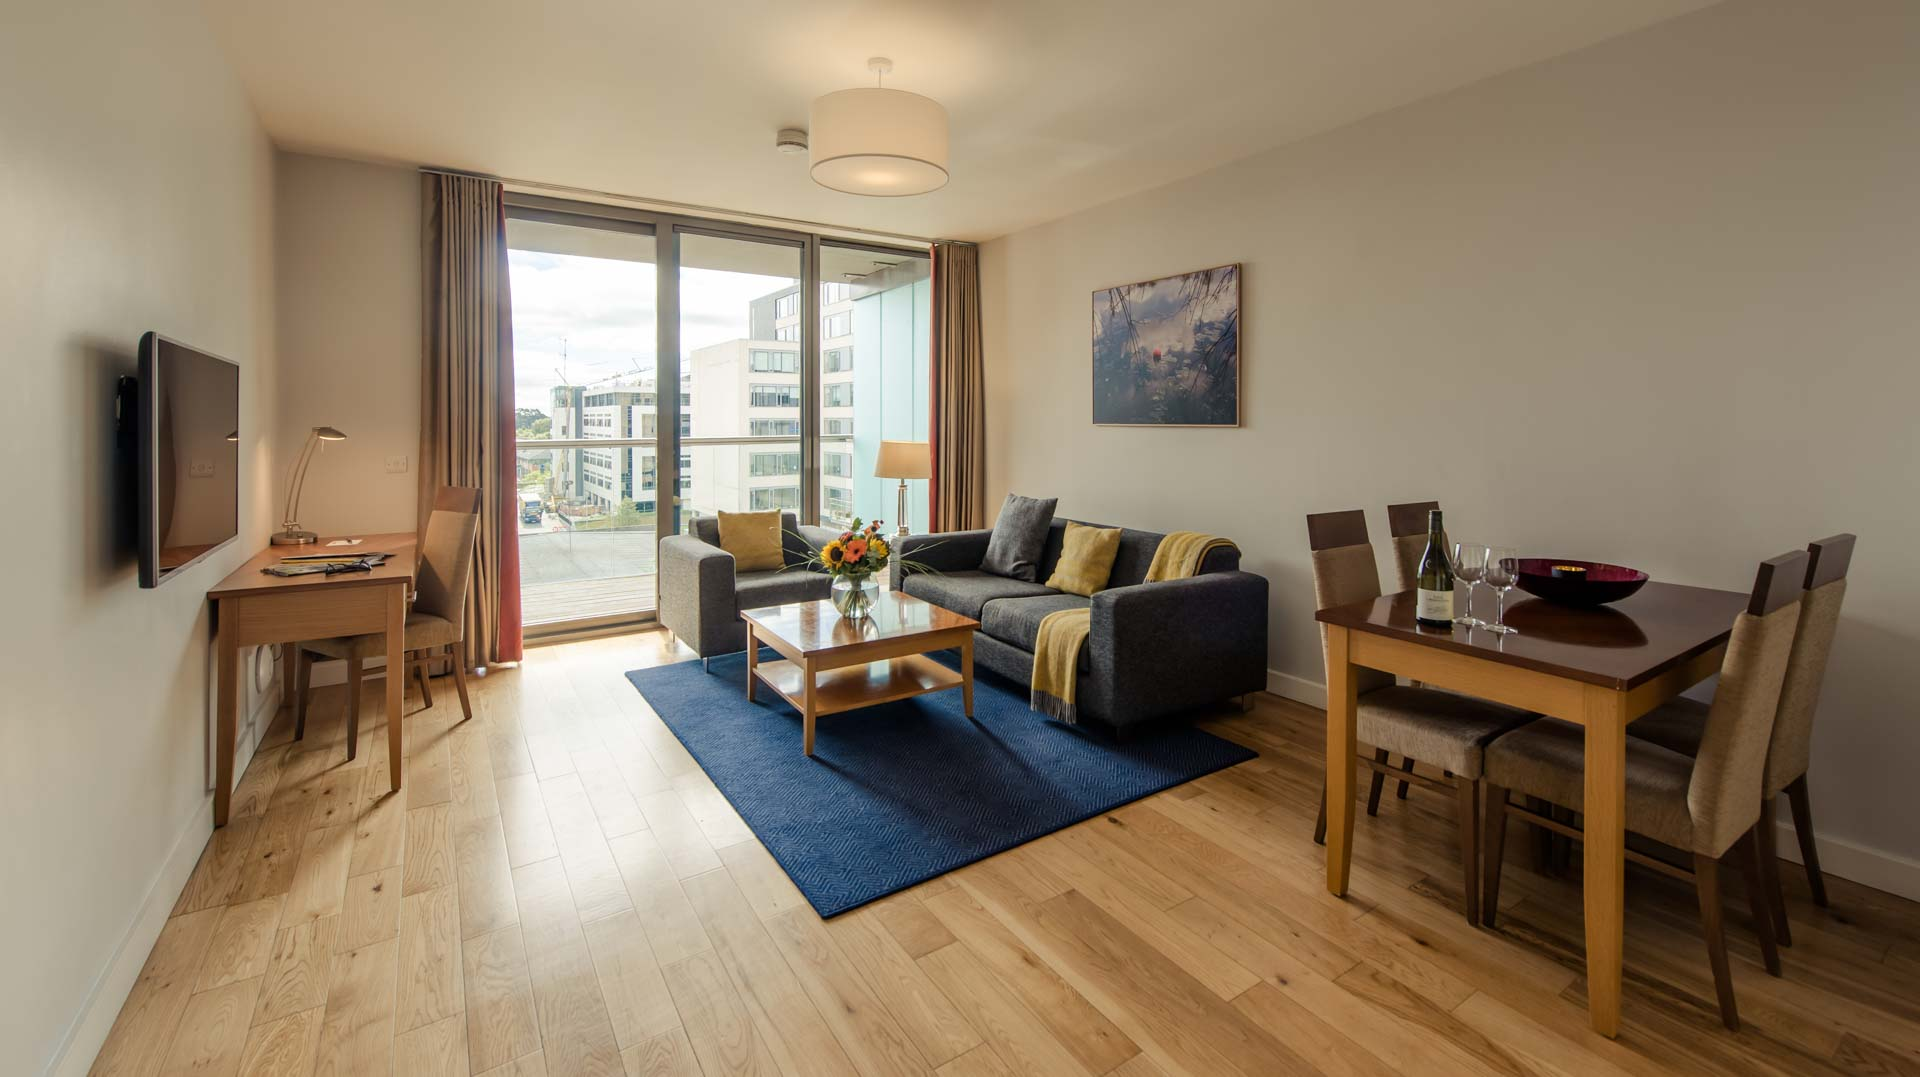 Living room at Premier Suites Dublin Sandyford, Sandyford, Dublin